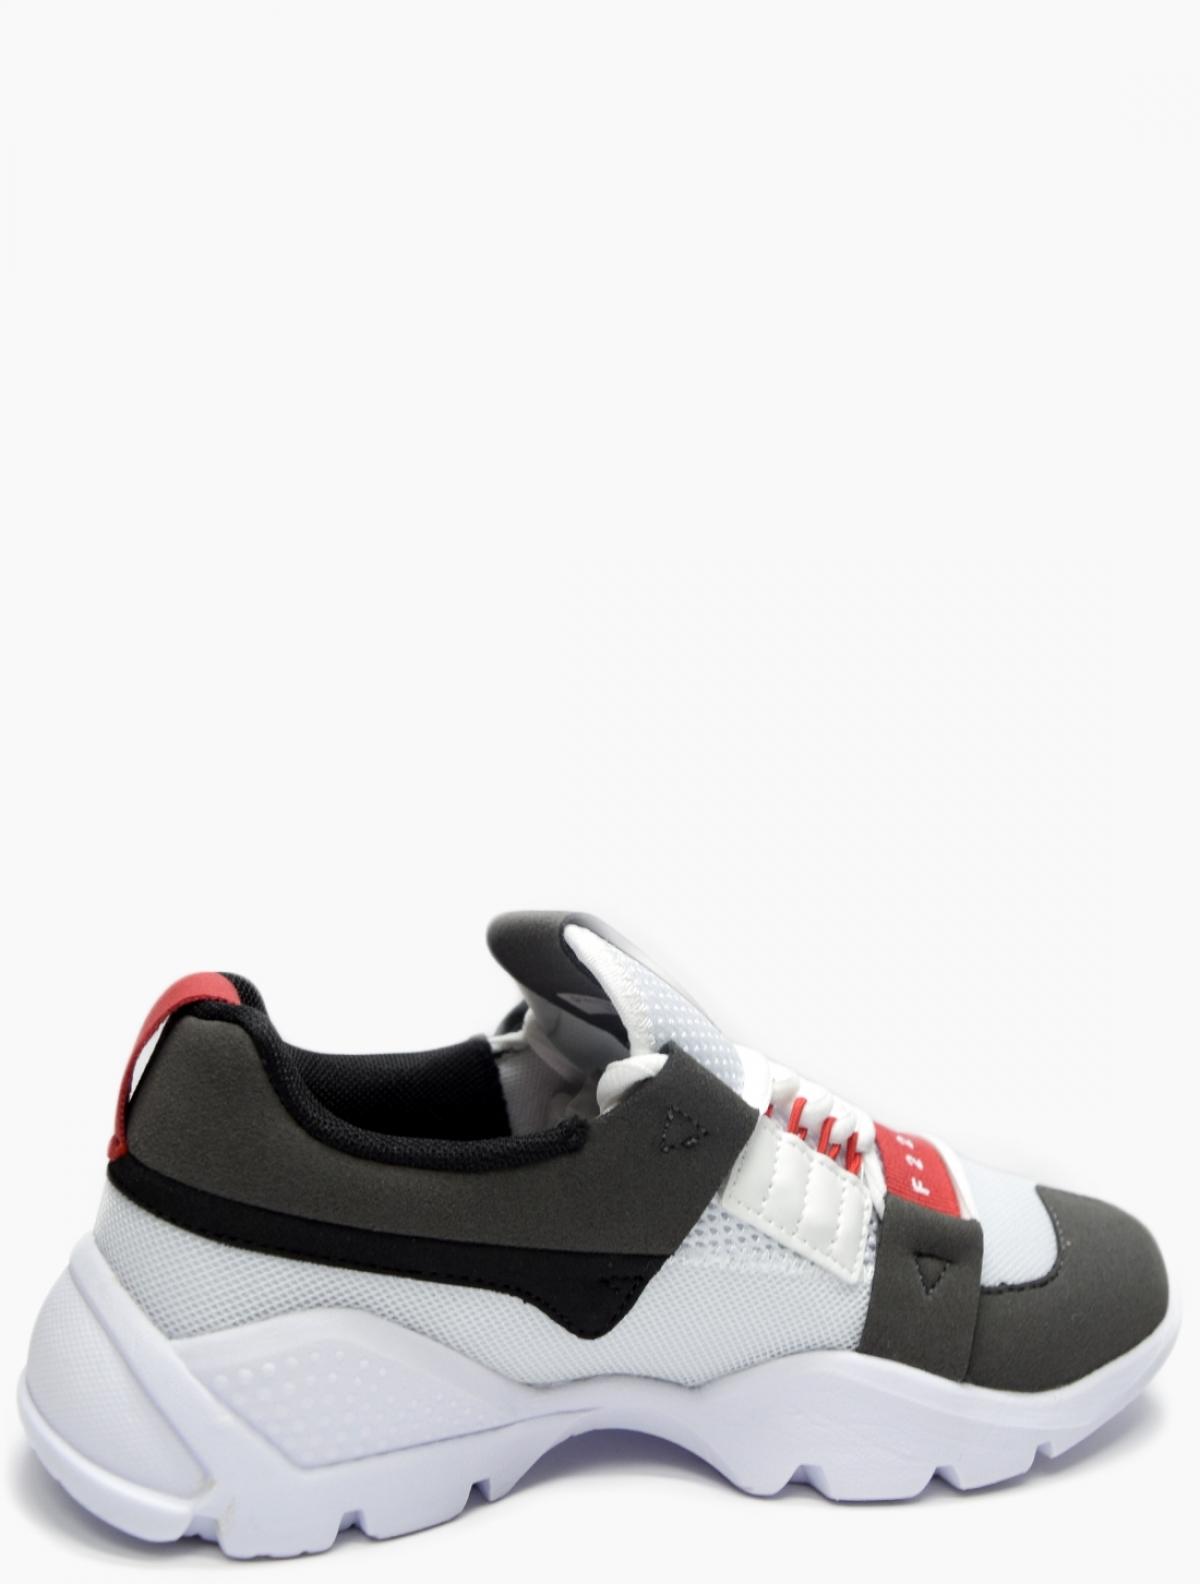 Torsion Field 914119-8 женские кроссовки